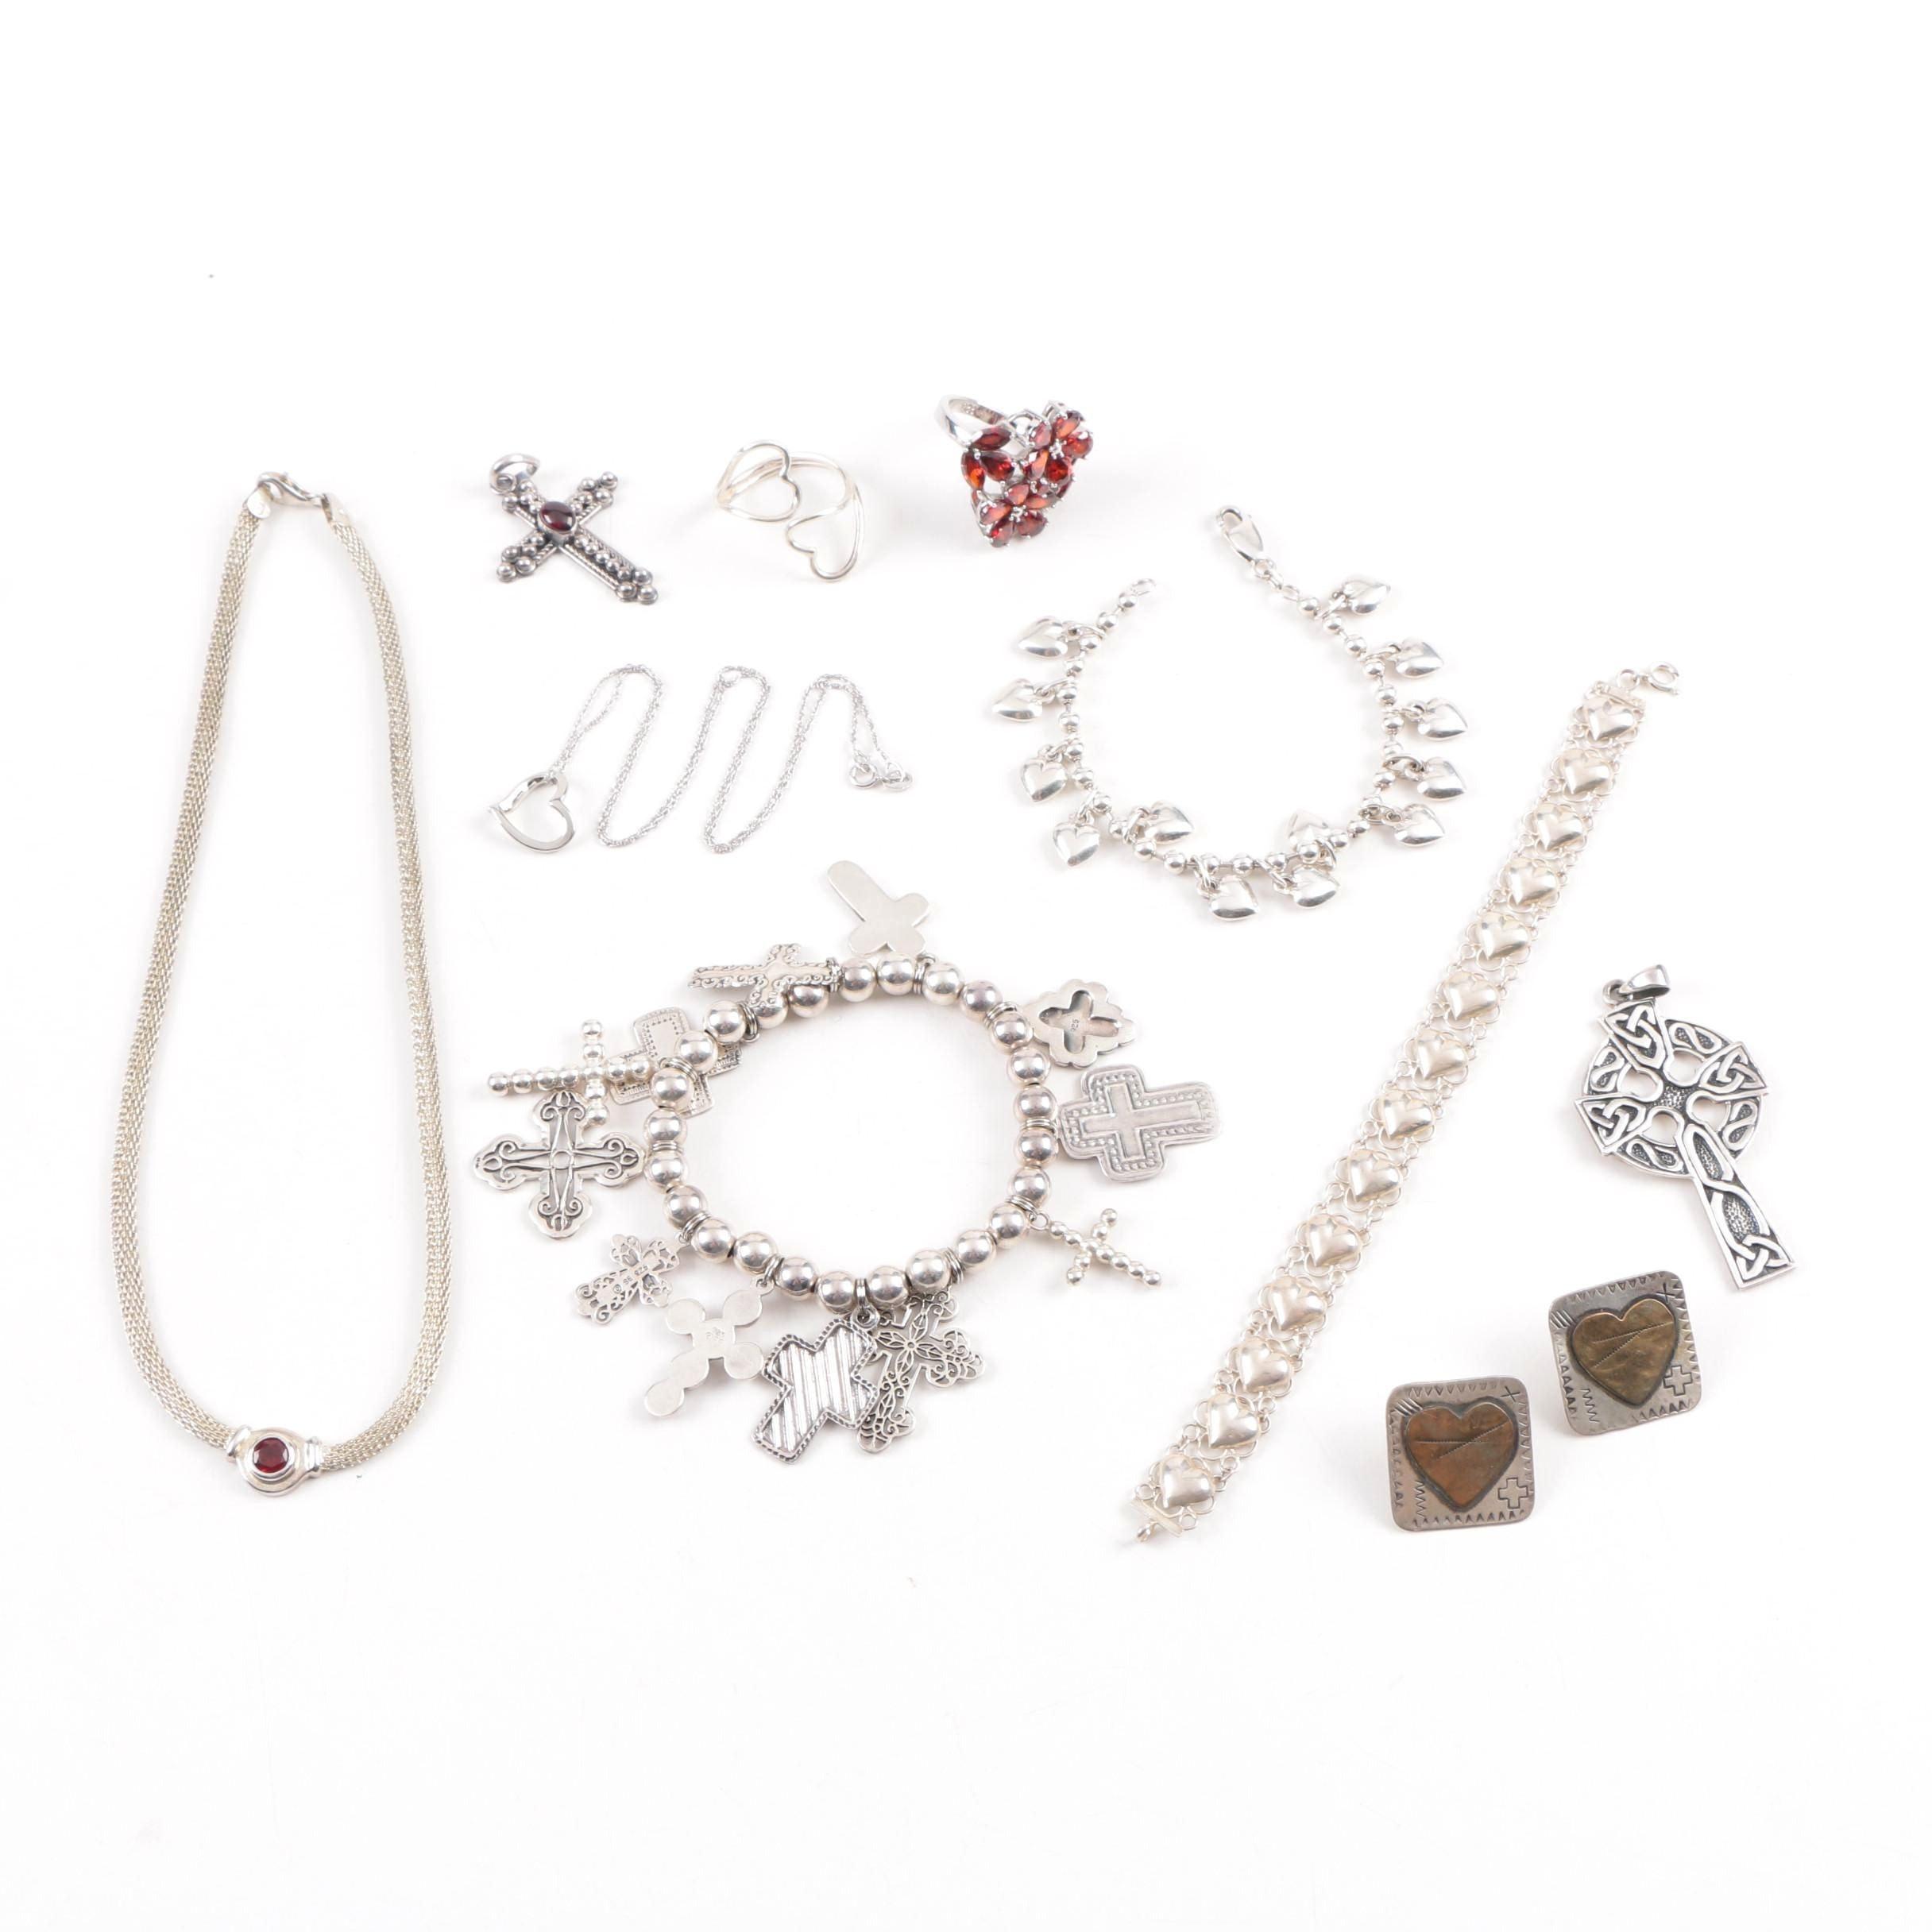 Sterling Silver Garnet Jewelry Assortment